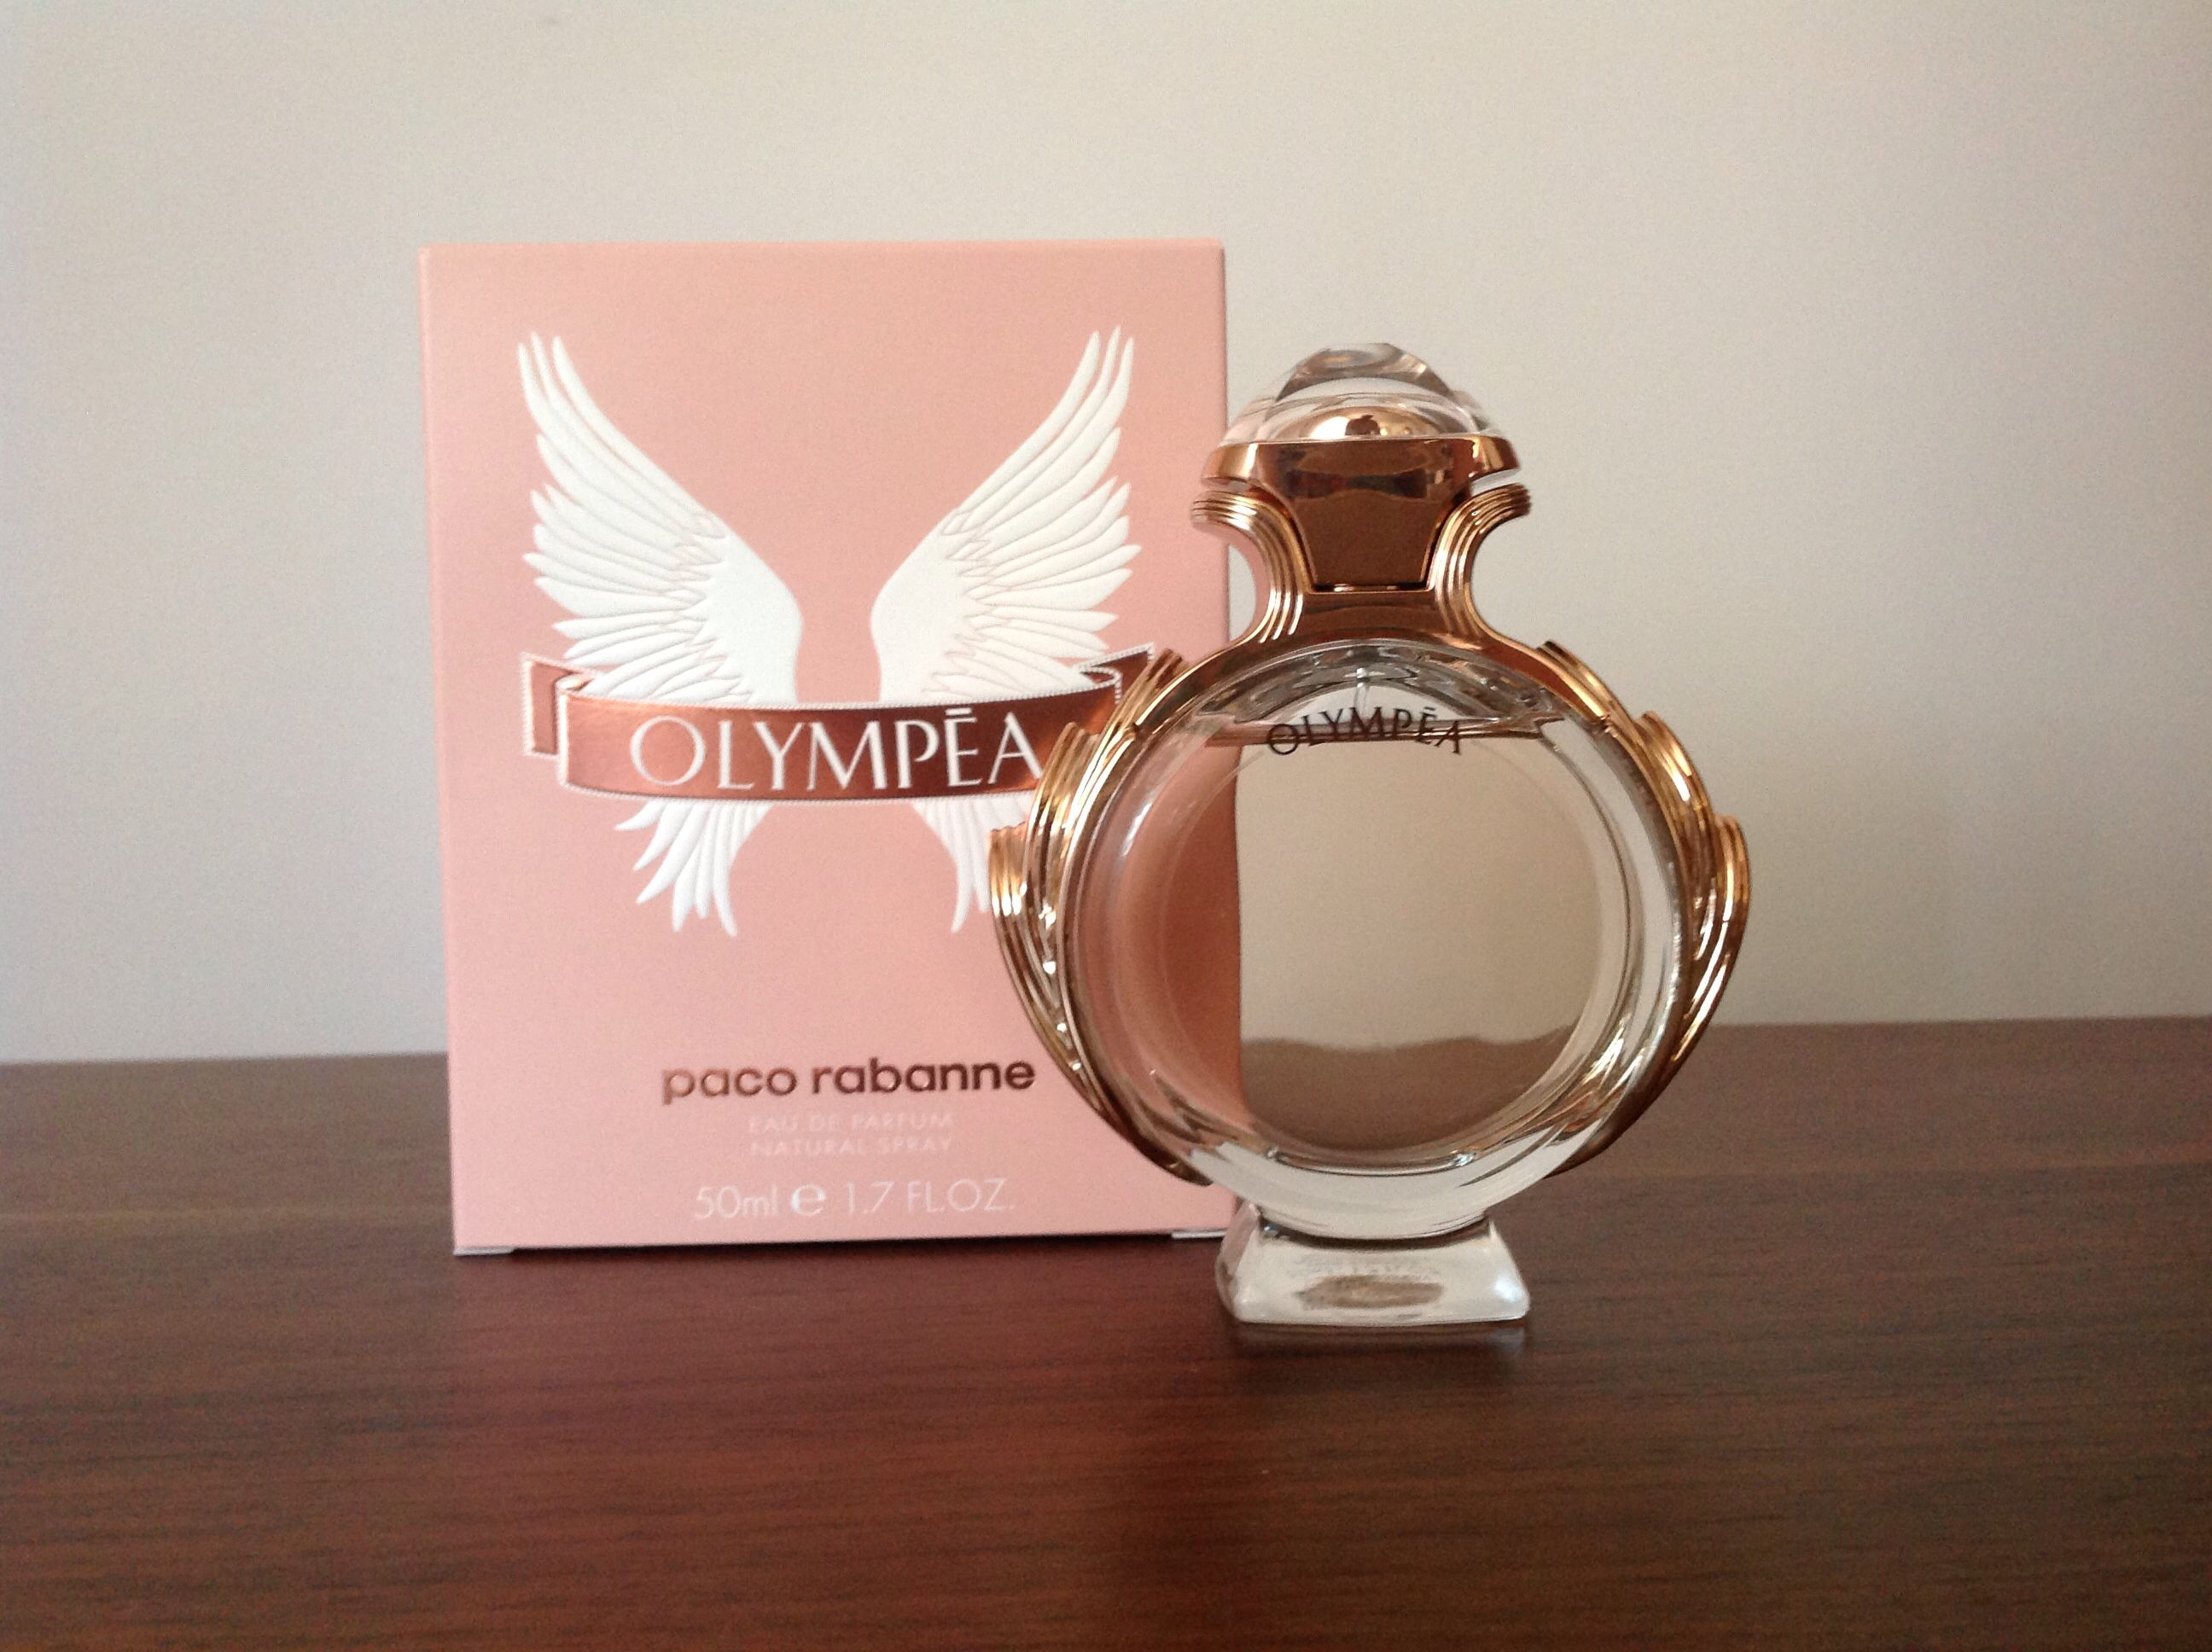 Paco rabanne olympea perfume pinterest paco rabanne for Paco rabanne women s fragrance